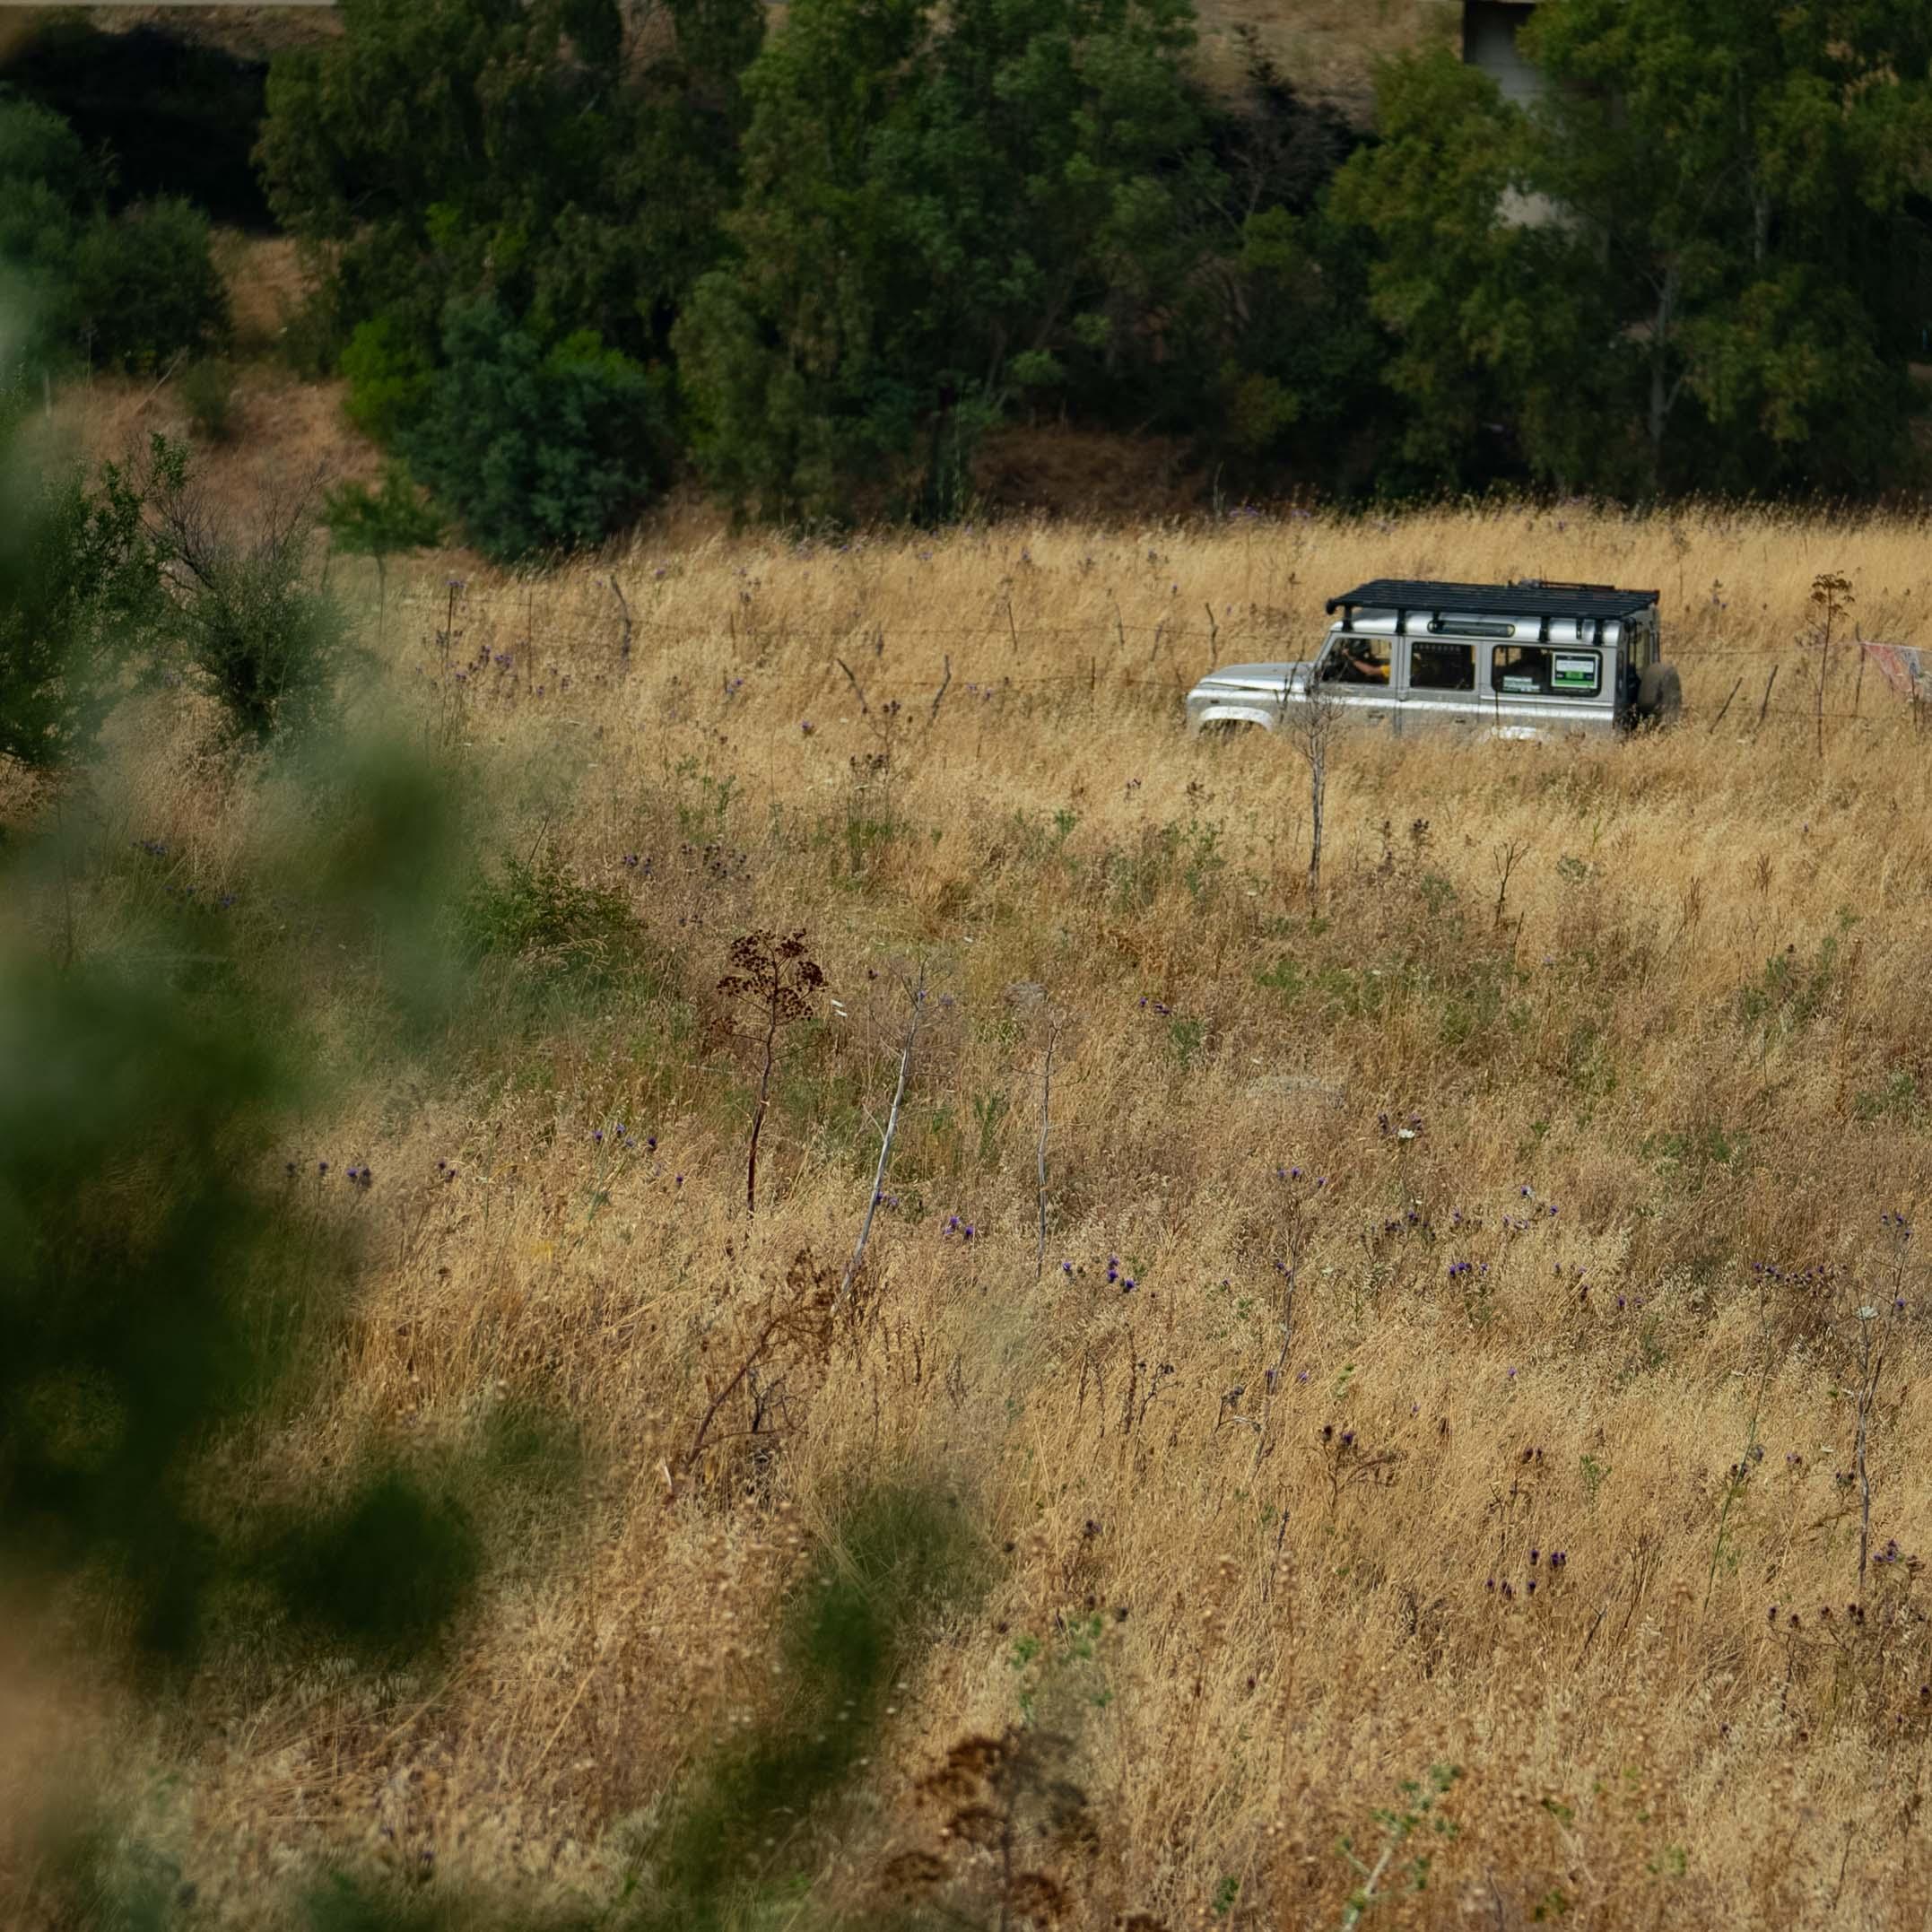 Land_Rover_Tour_Sicilia_2021_Land_Rover_Experience_Italia_-54